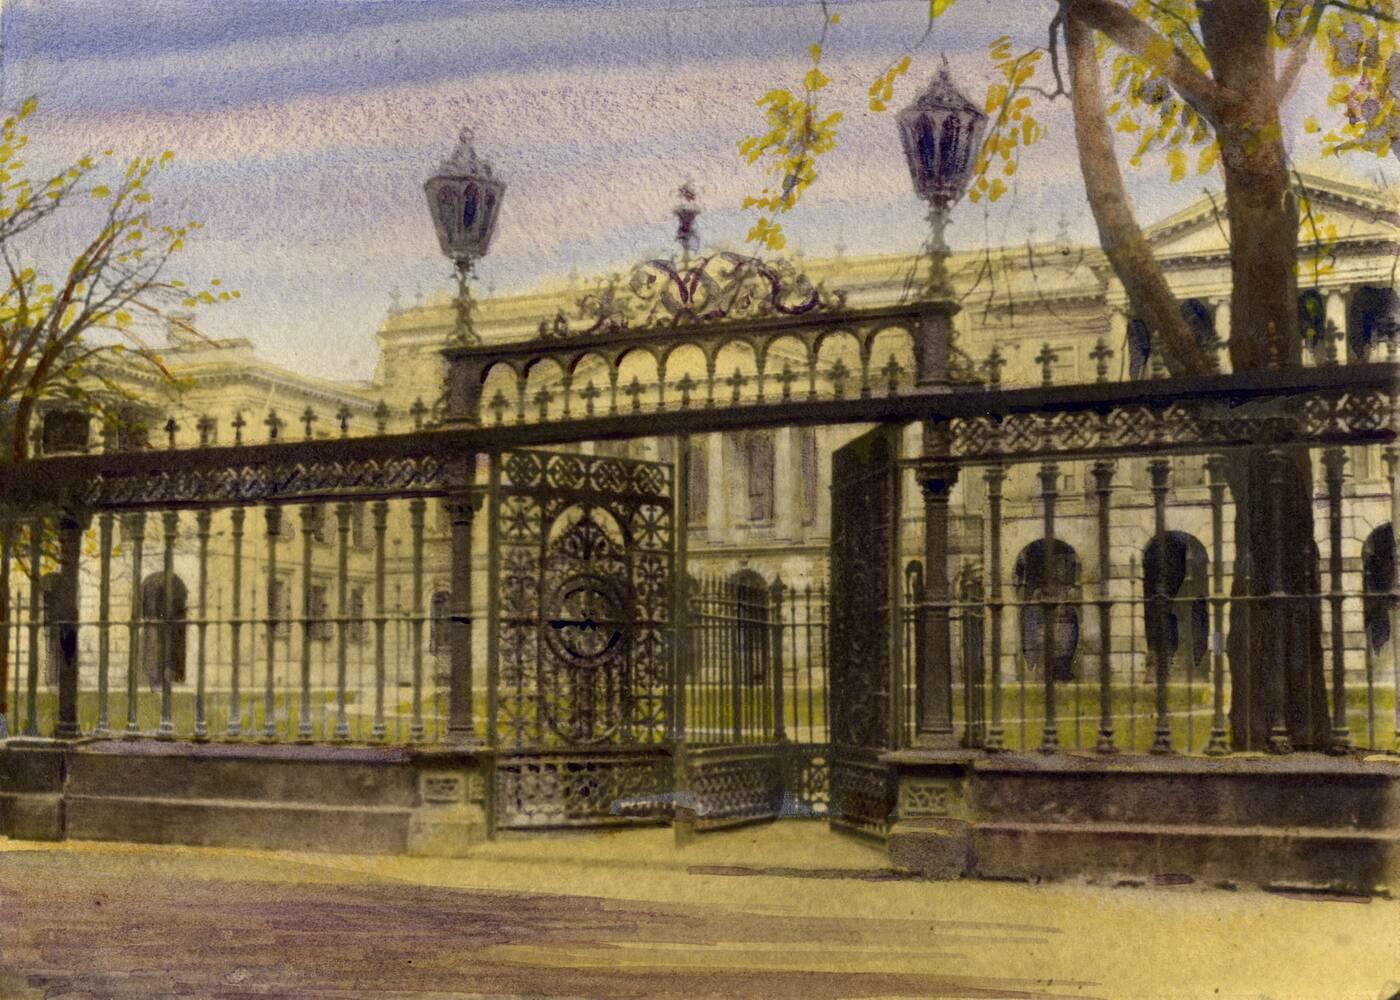 osgoode hall fence